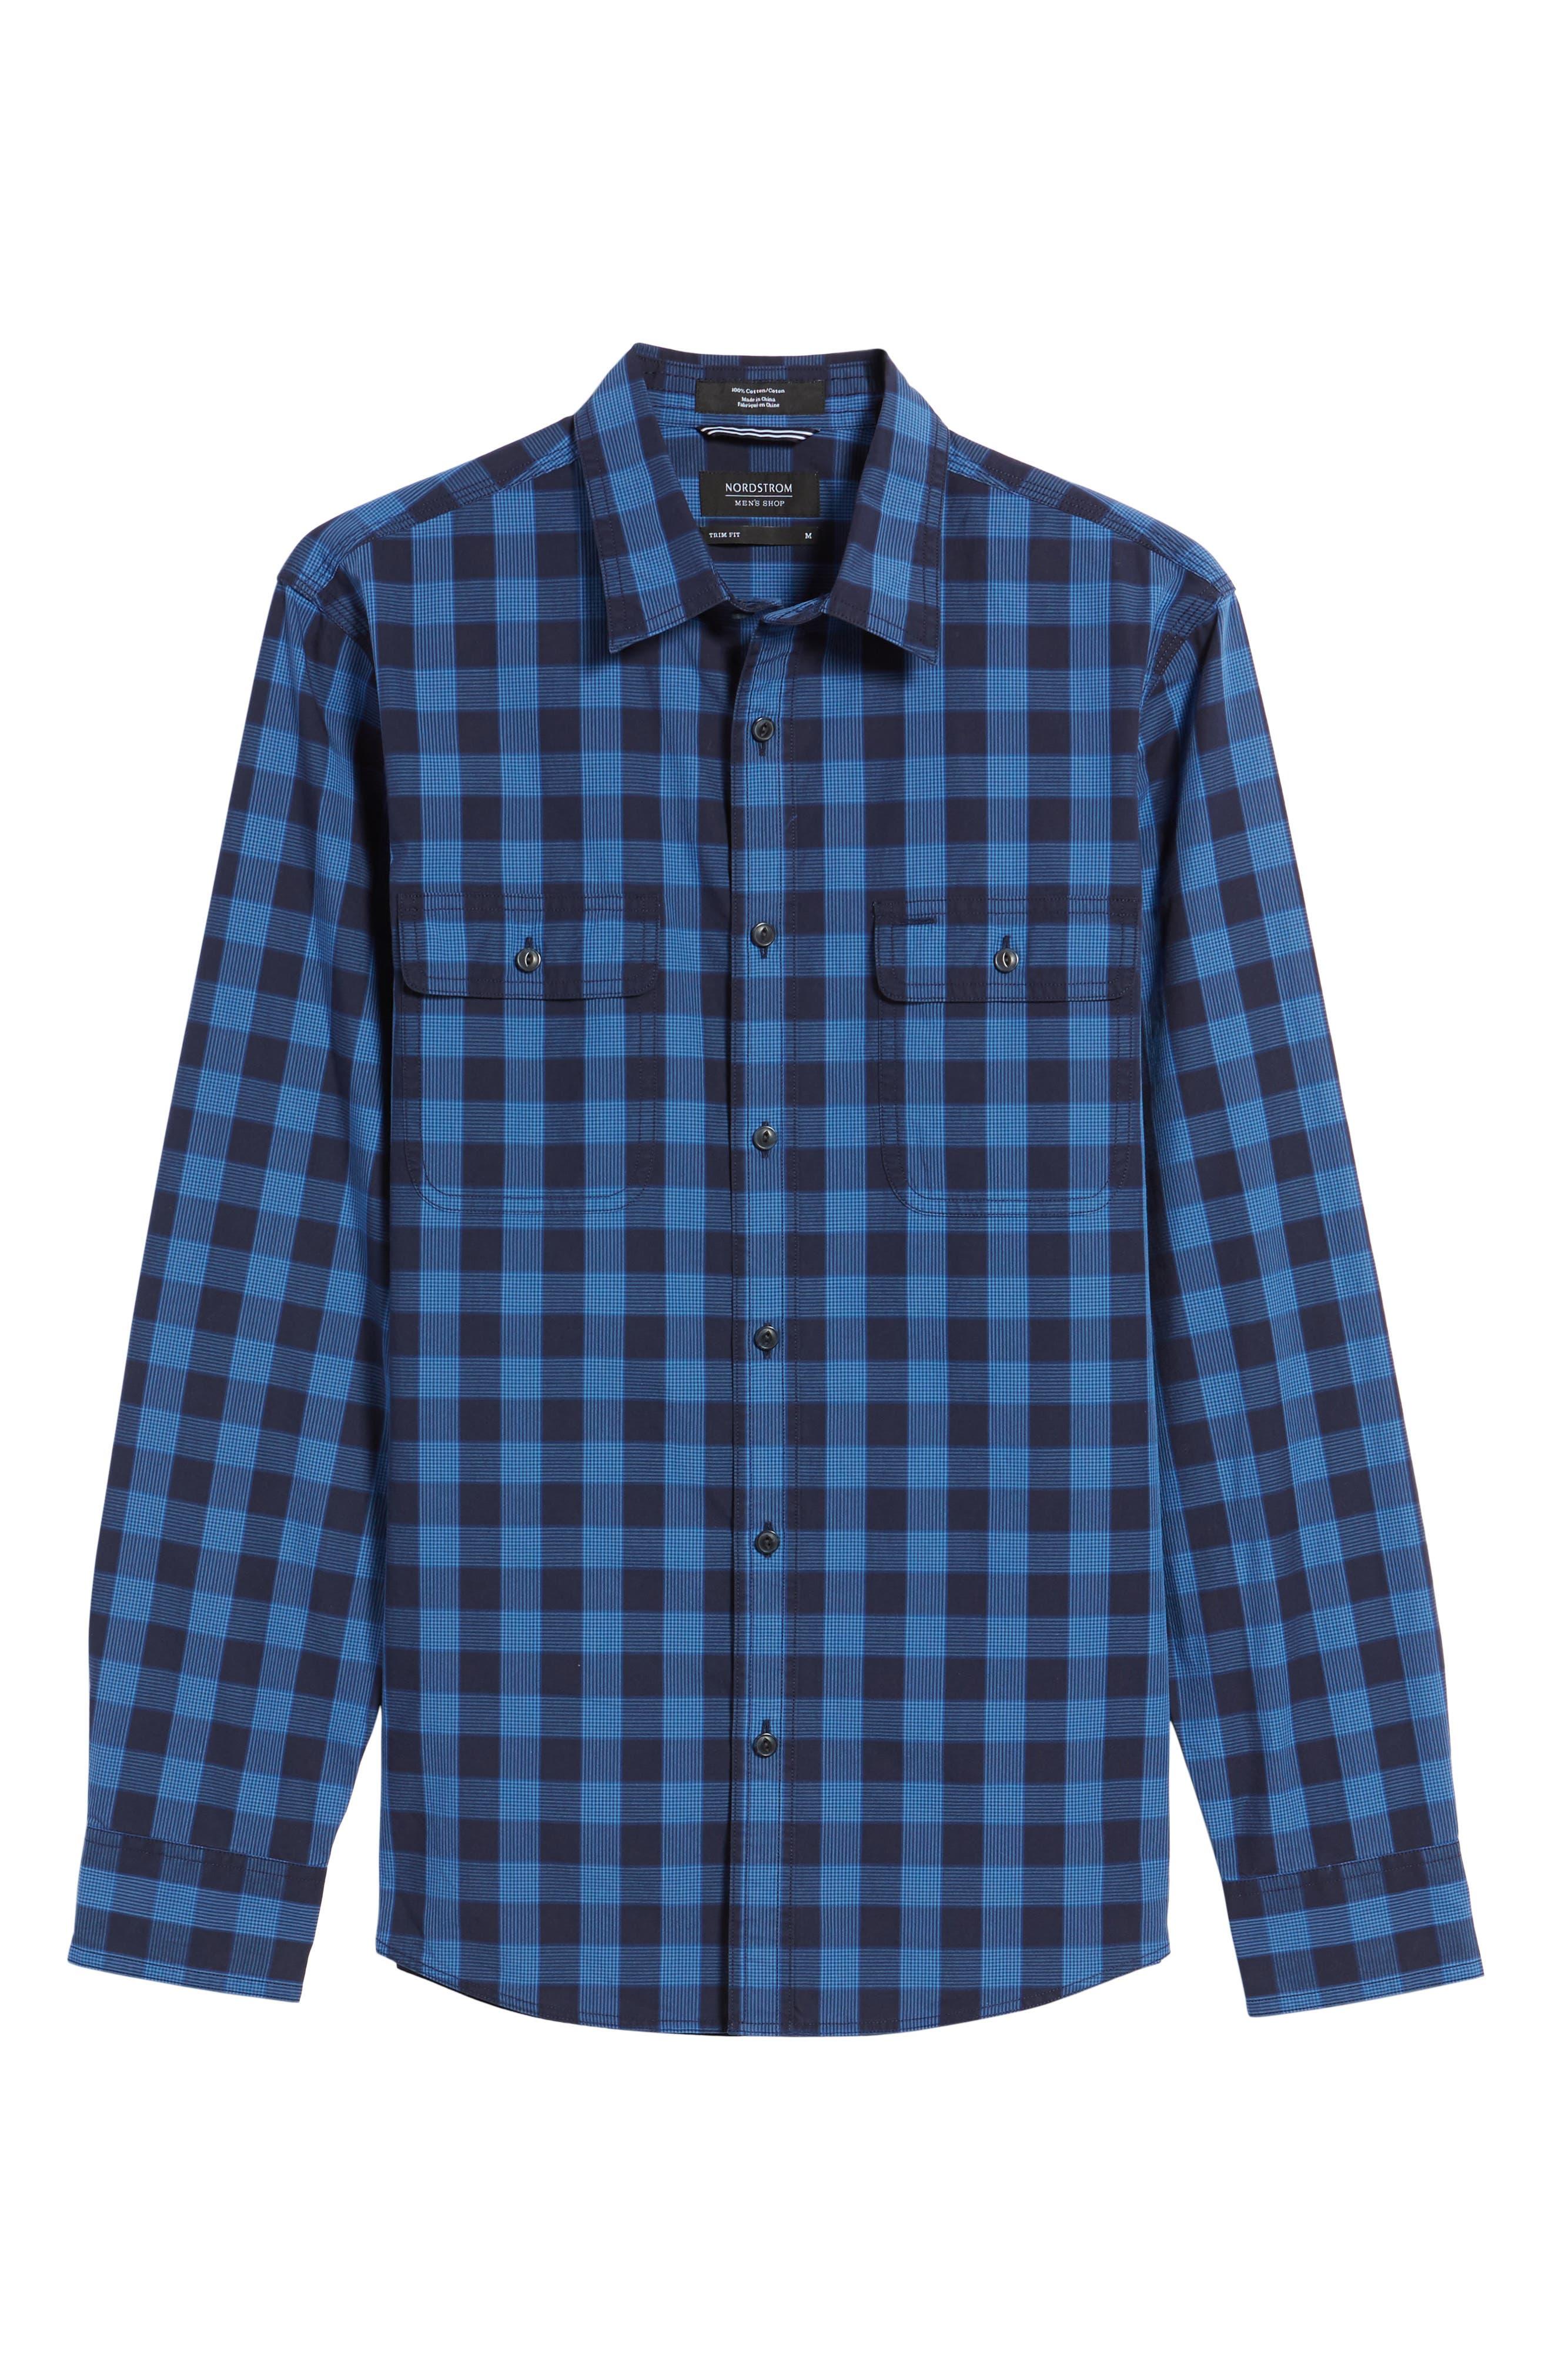 Trim Fit Plaid Trucker Sport Shirt,                             Alternate thumbnail 6, color,                             Navy Iris Blue Check